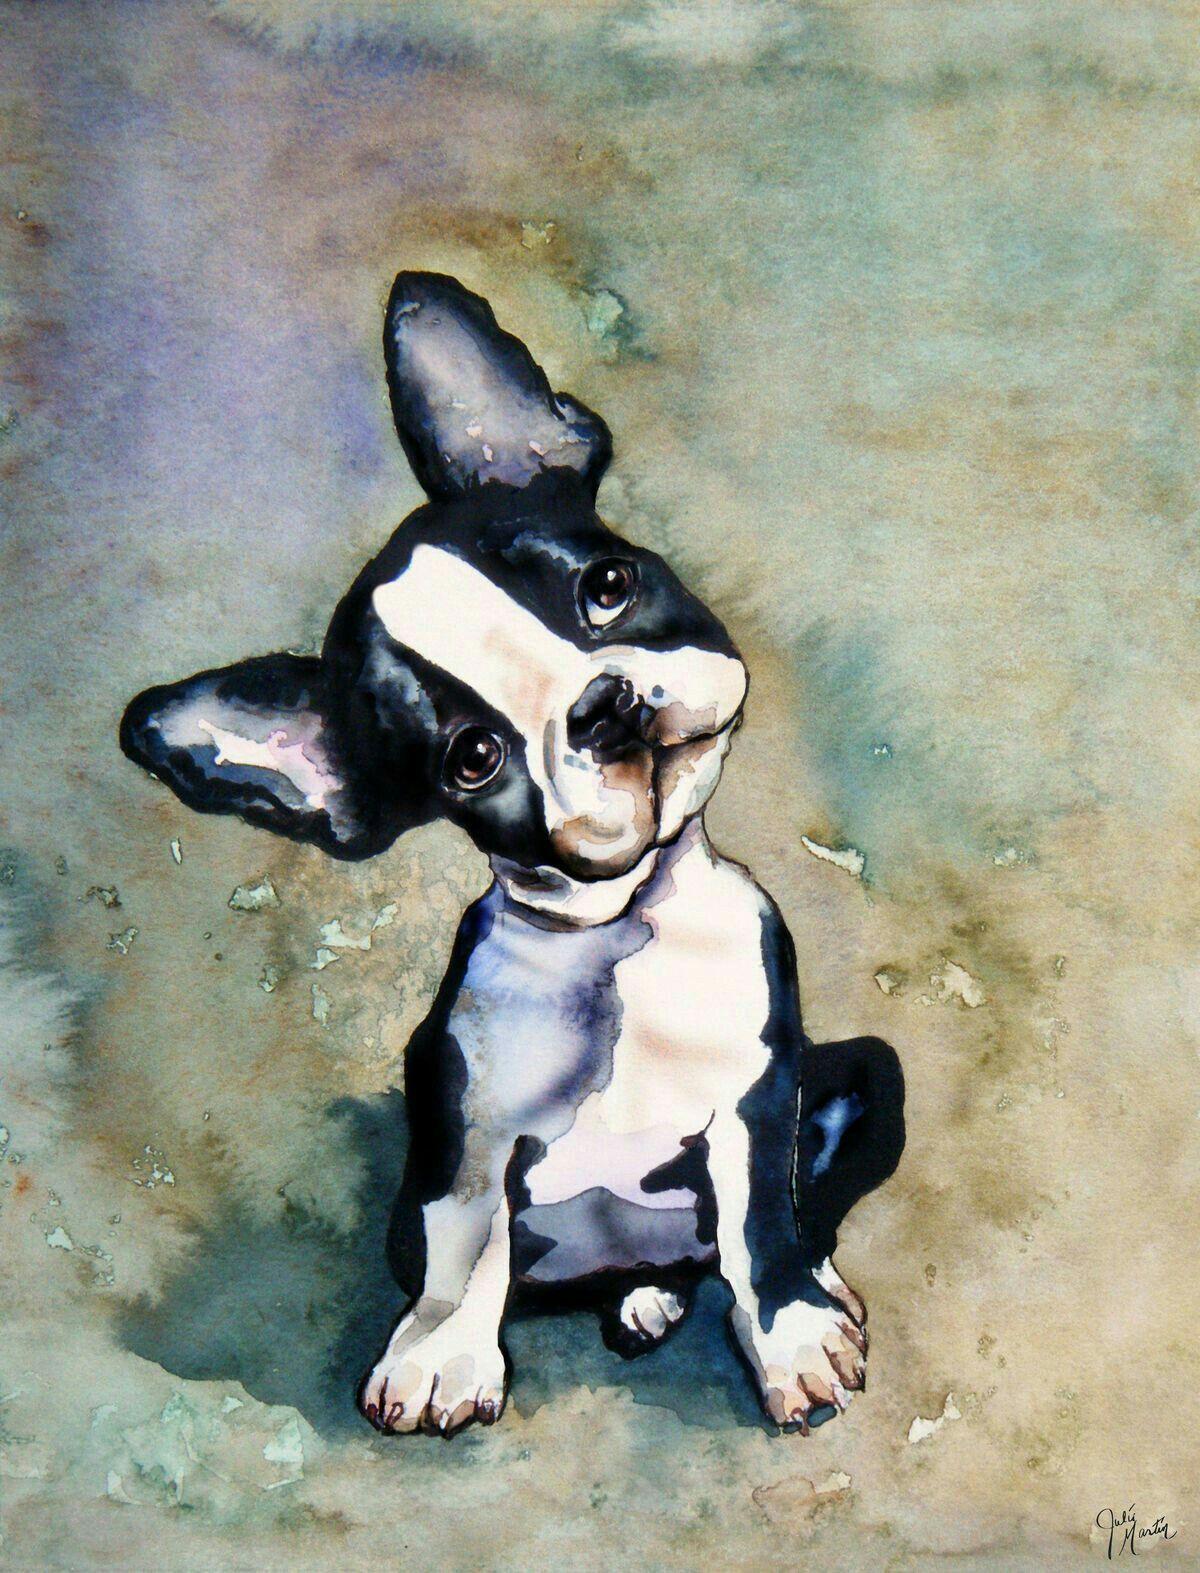 Pin By Cassandra N On Puppies In 2019 Boston Terrier Boston